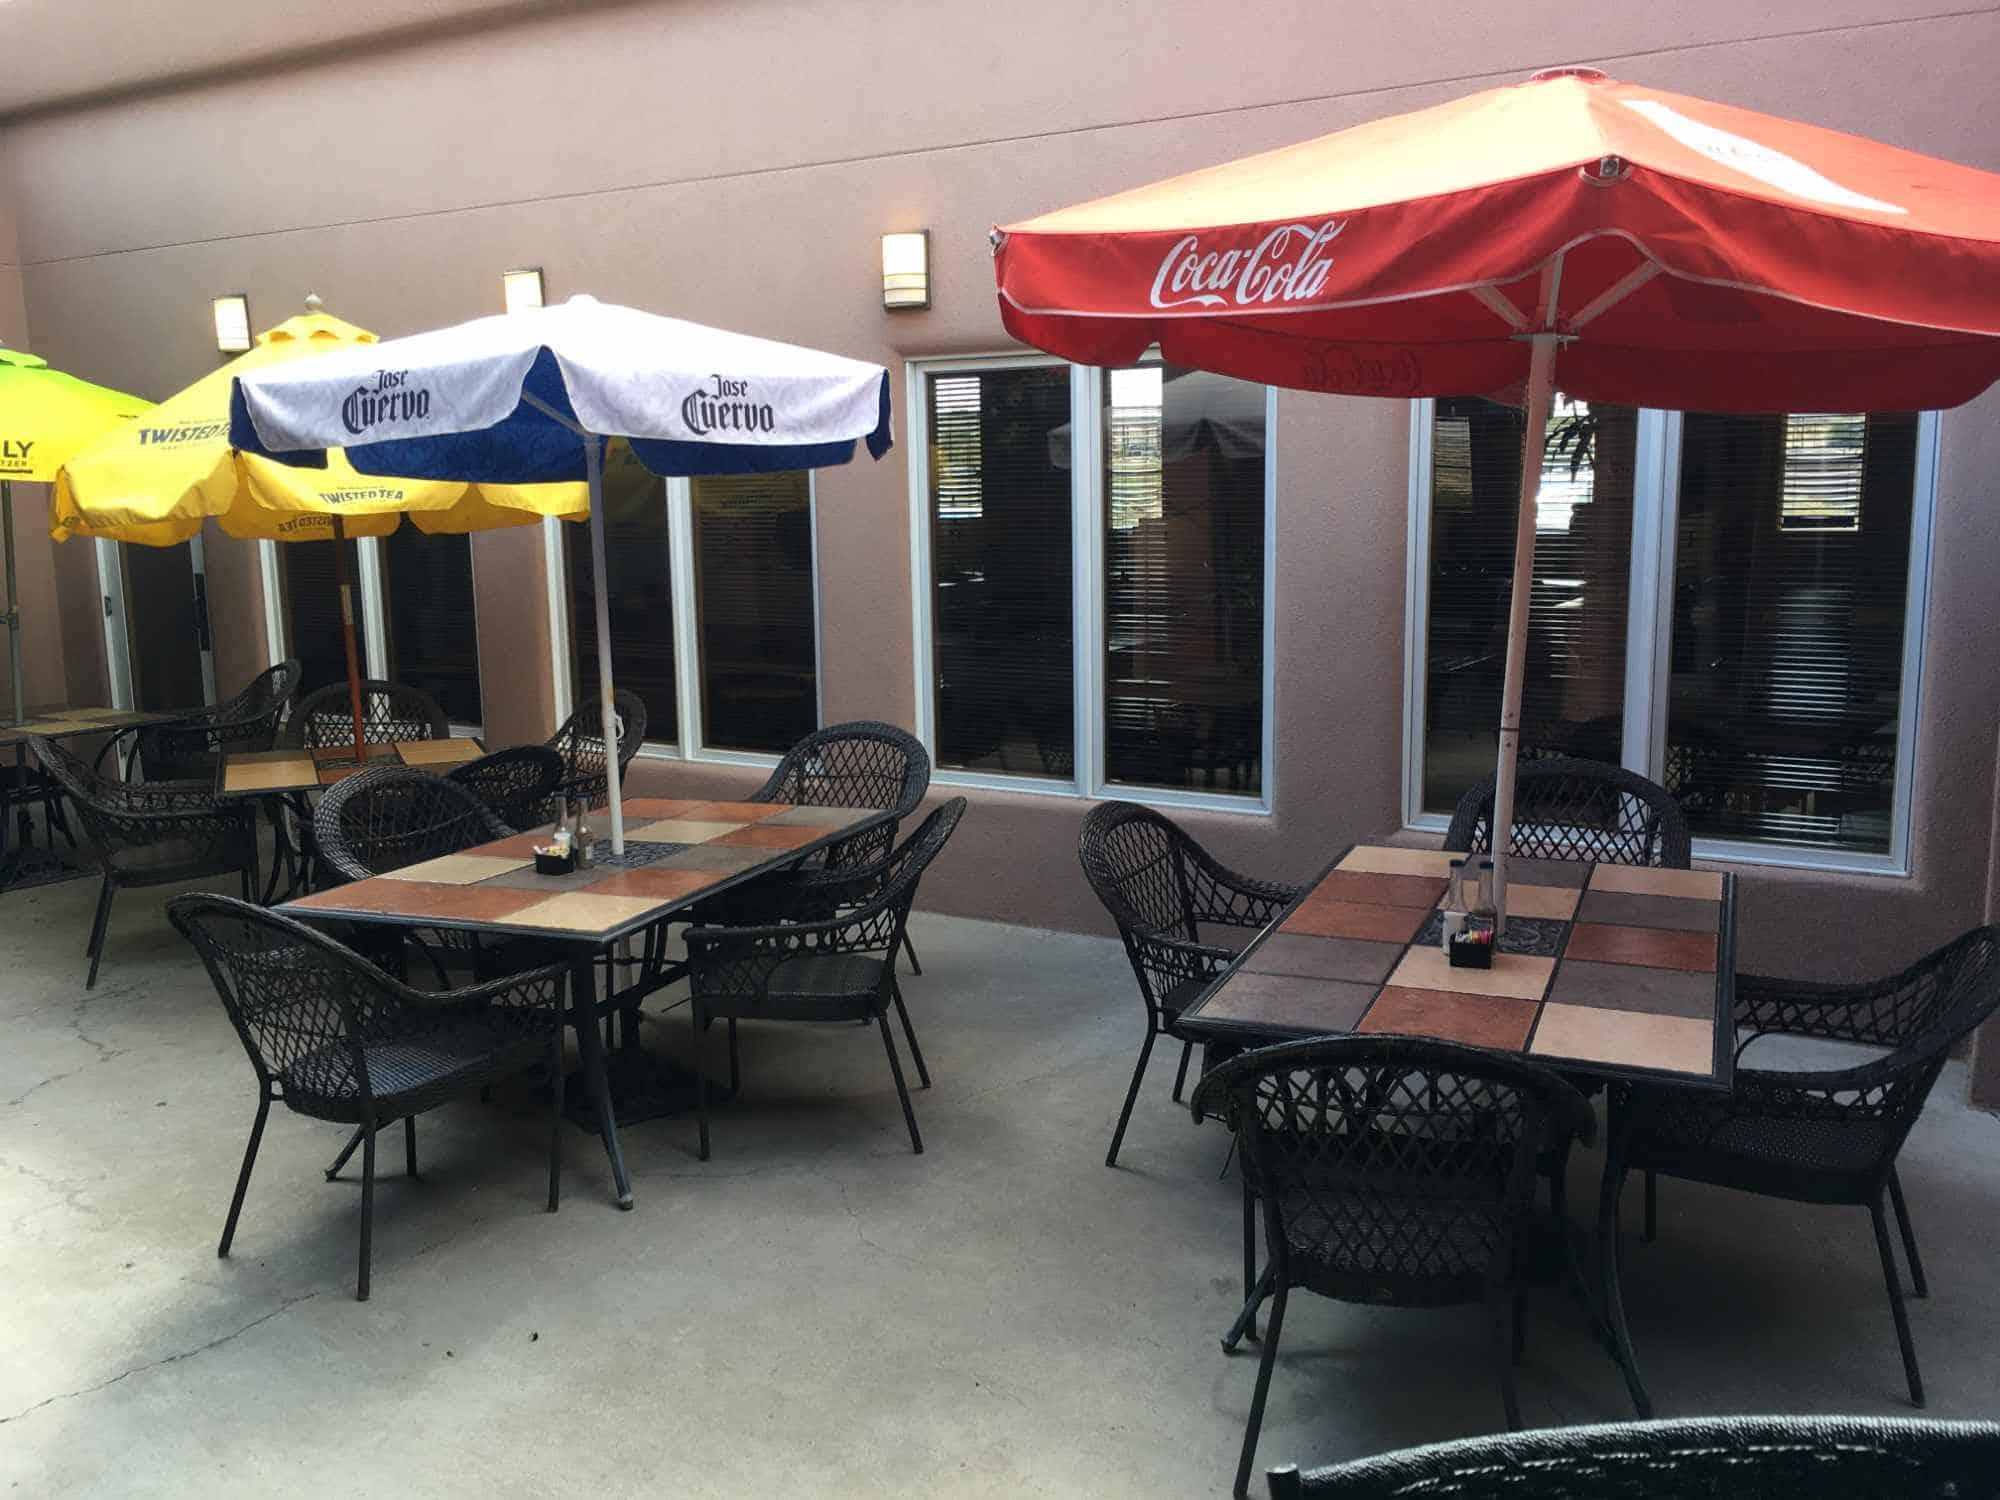 La Cocina Hot Stuff patio seating